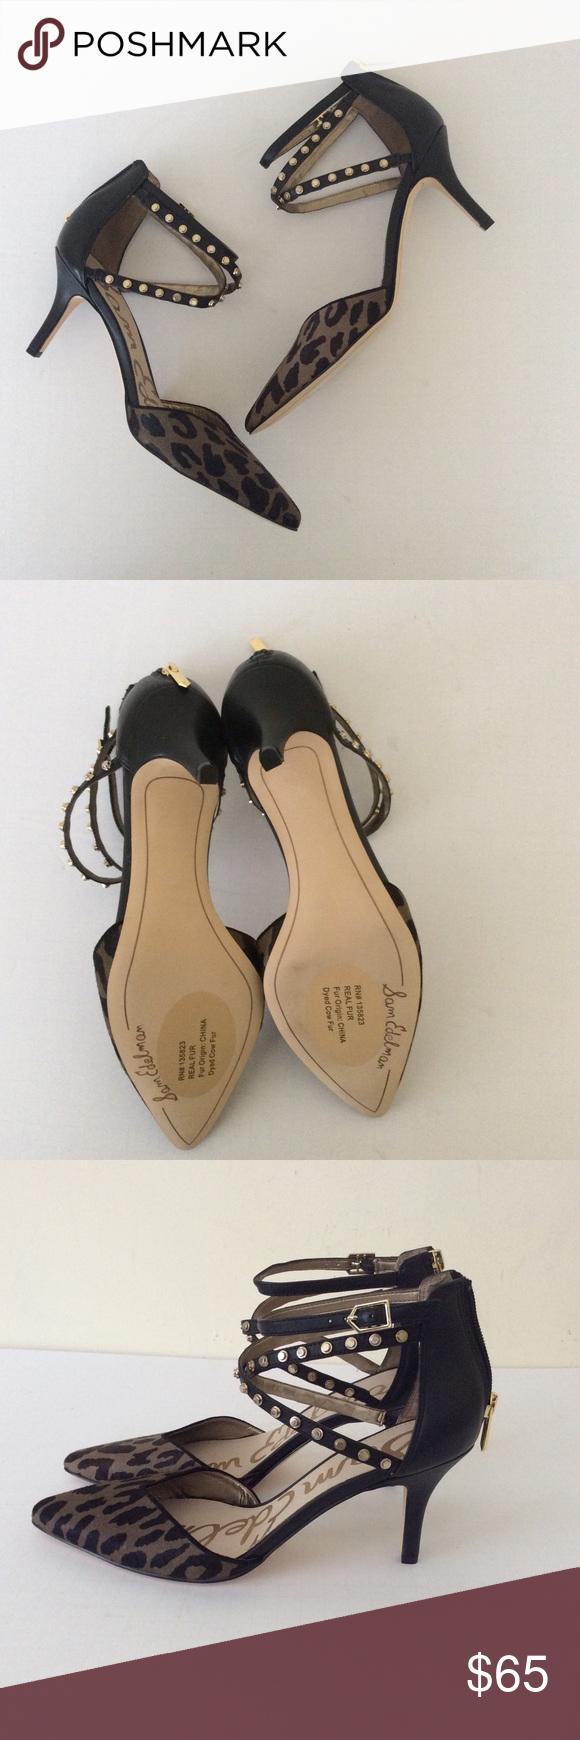 Sam Edelman Orla Olive Heels 9M Sam Edelman Orla Olive Heels 9M Sam Edelman Shoes Heels